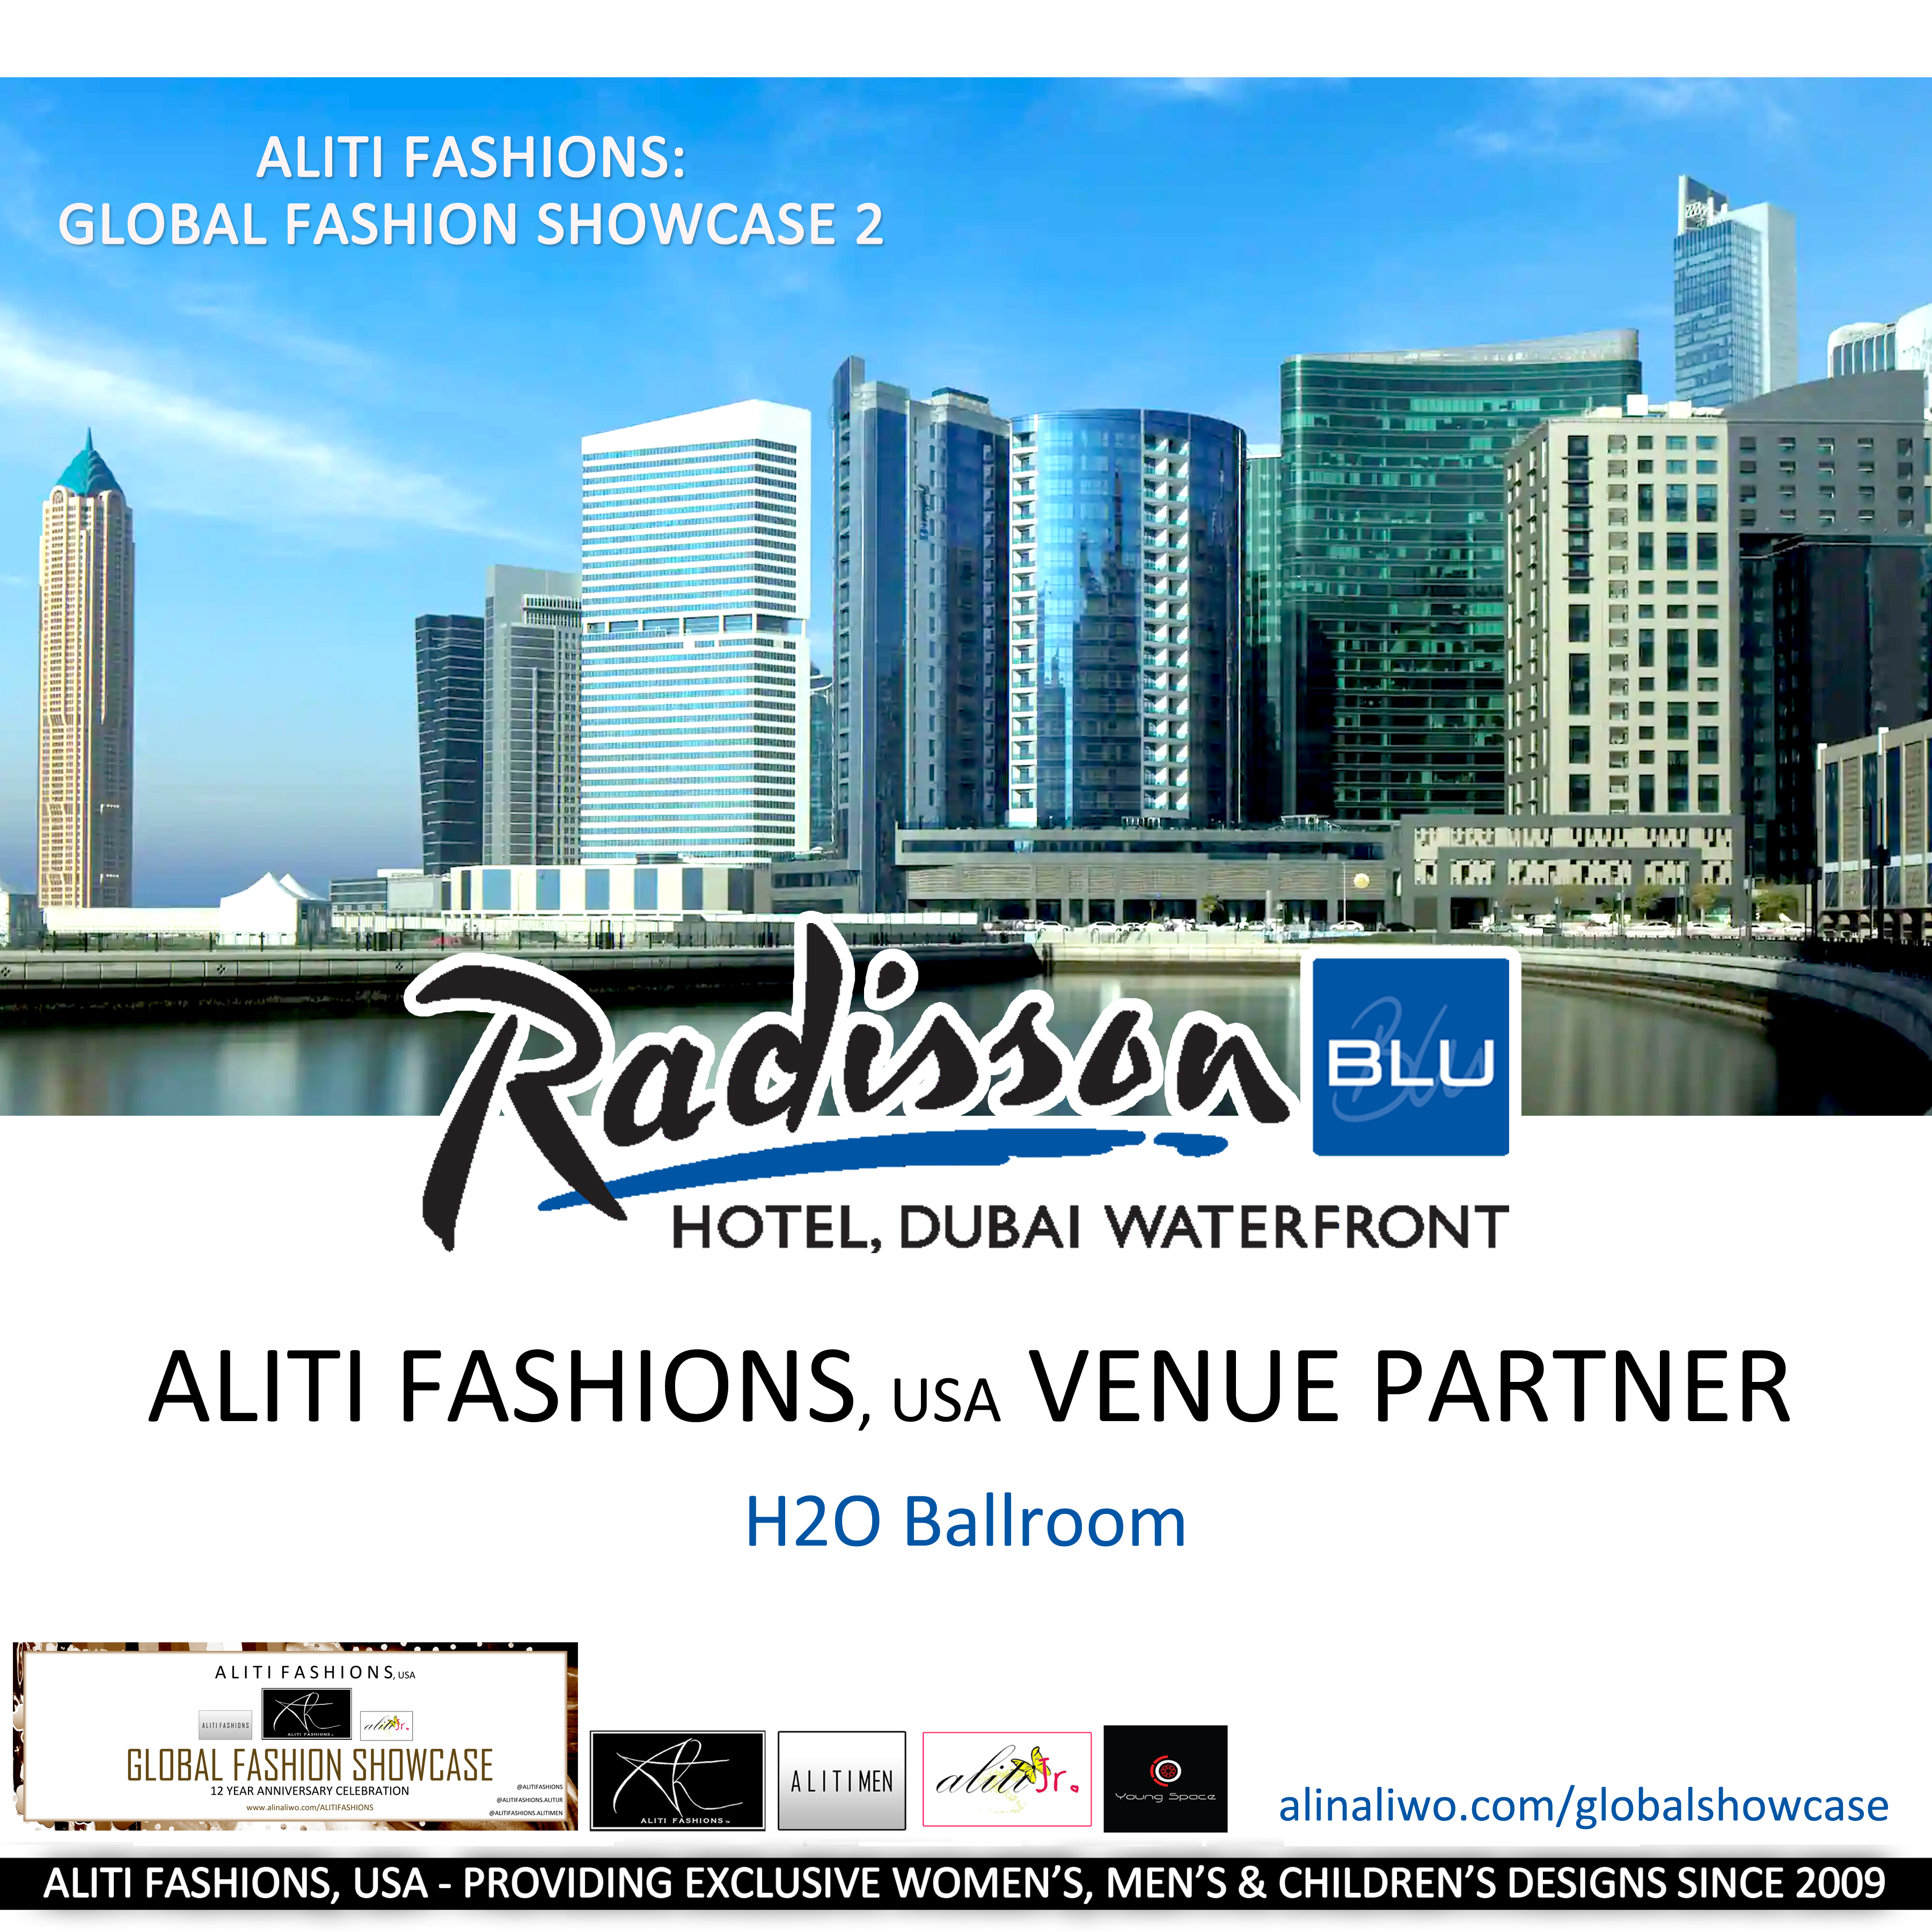 ALITI FASHIONS - Global Fashion Showcase 2